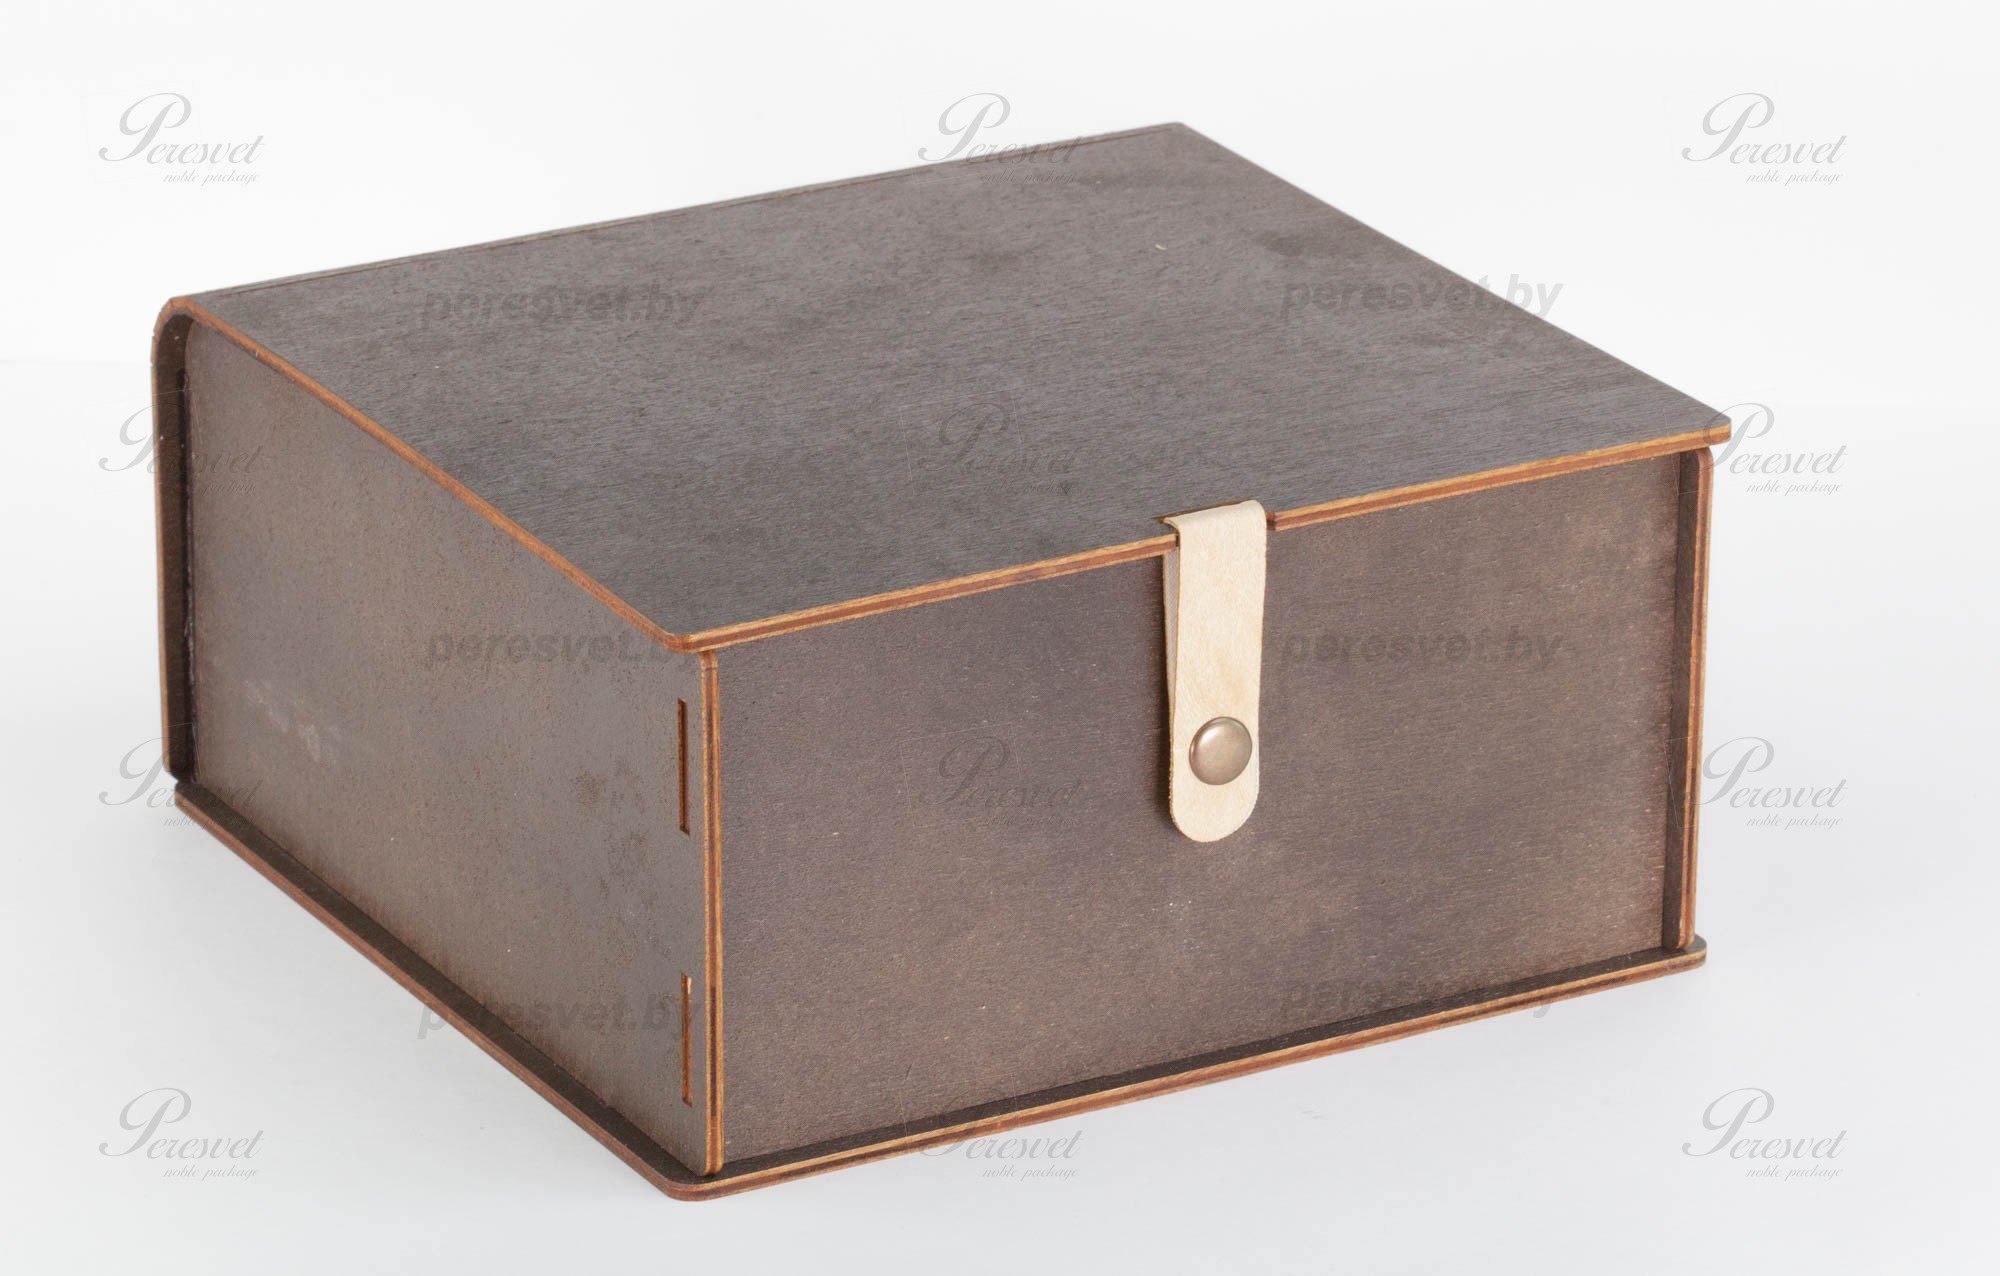 Упаковка деревянная на застежке на корпоративный подарок на peresvet.by